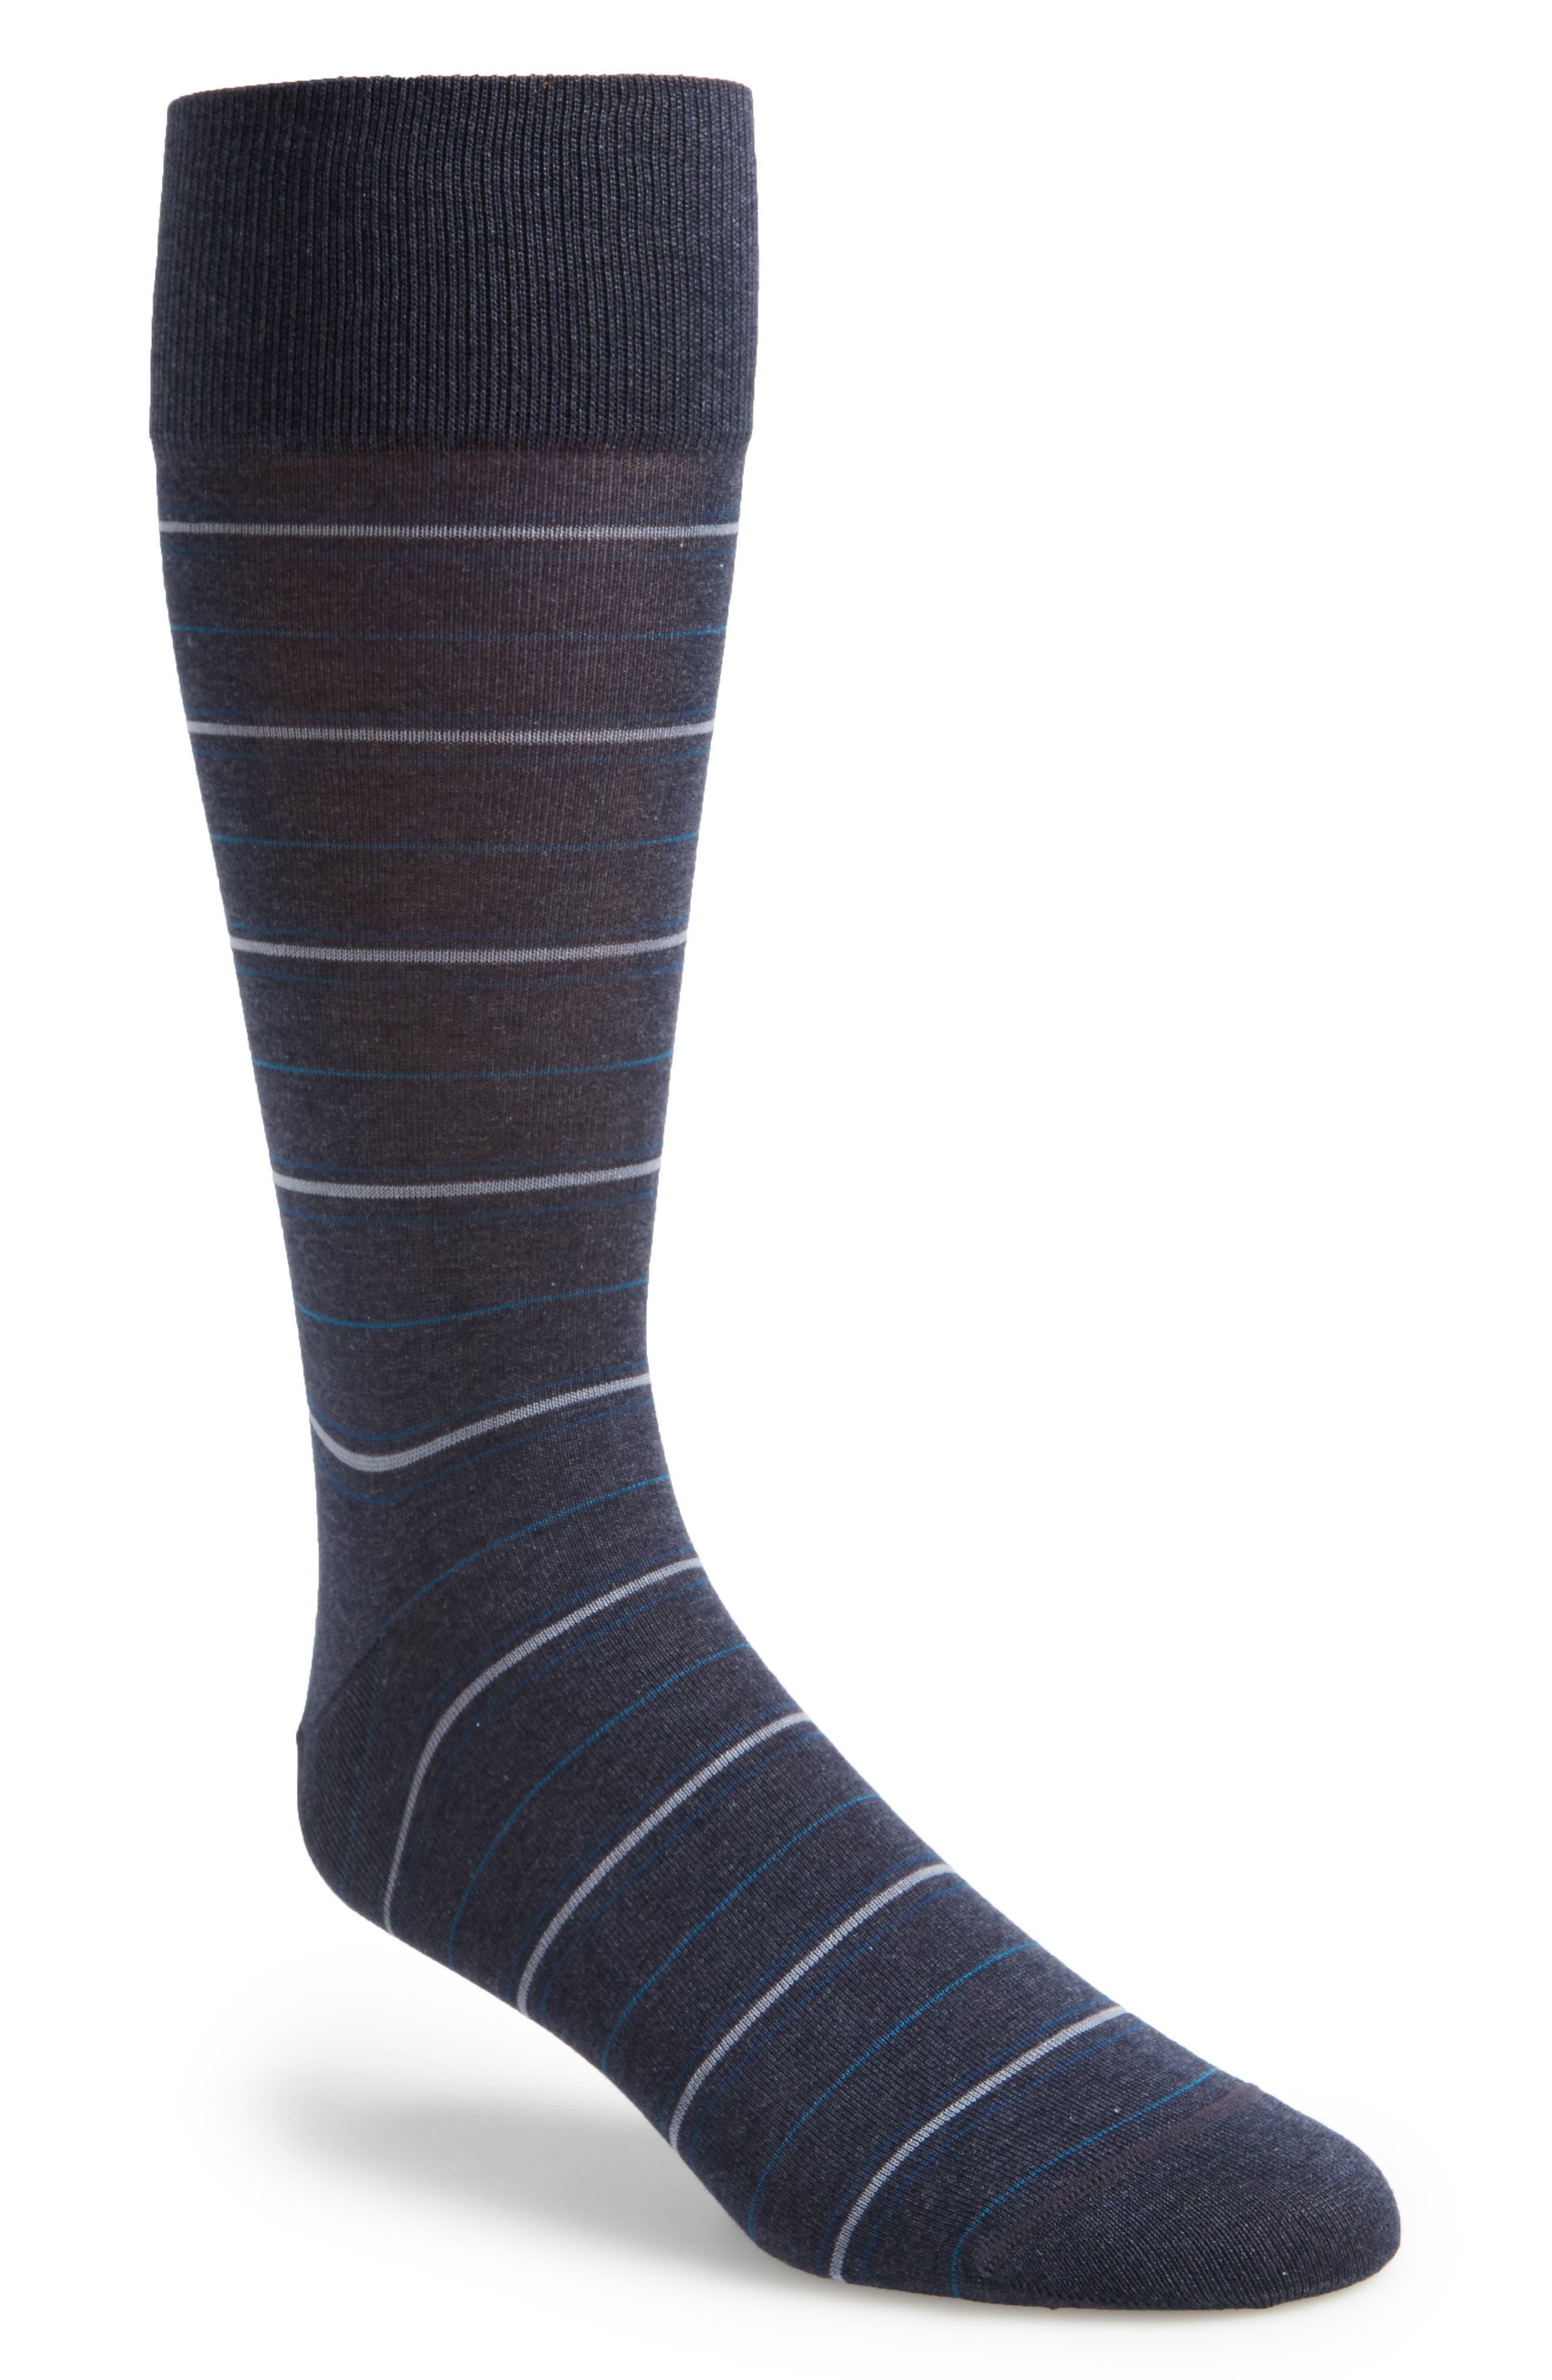 Main Image - John W. Nordstrom® Interlines Socks